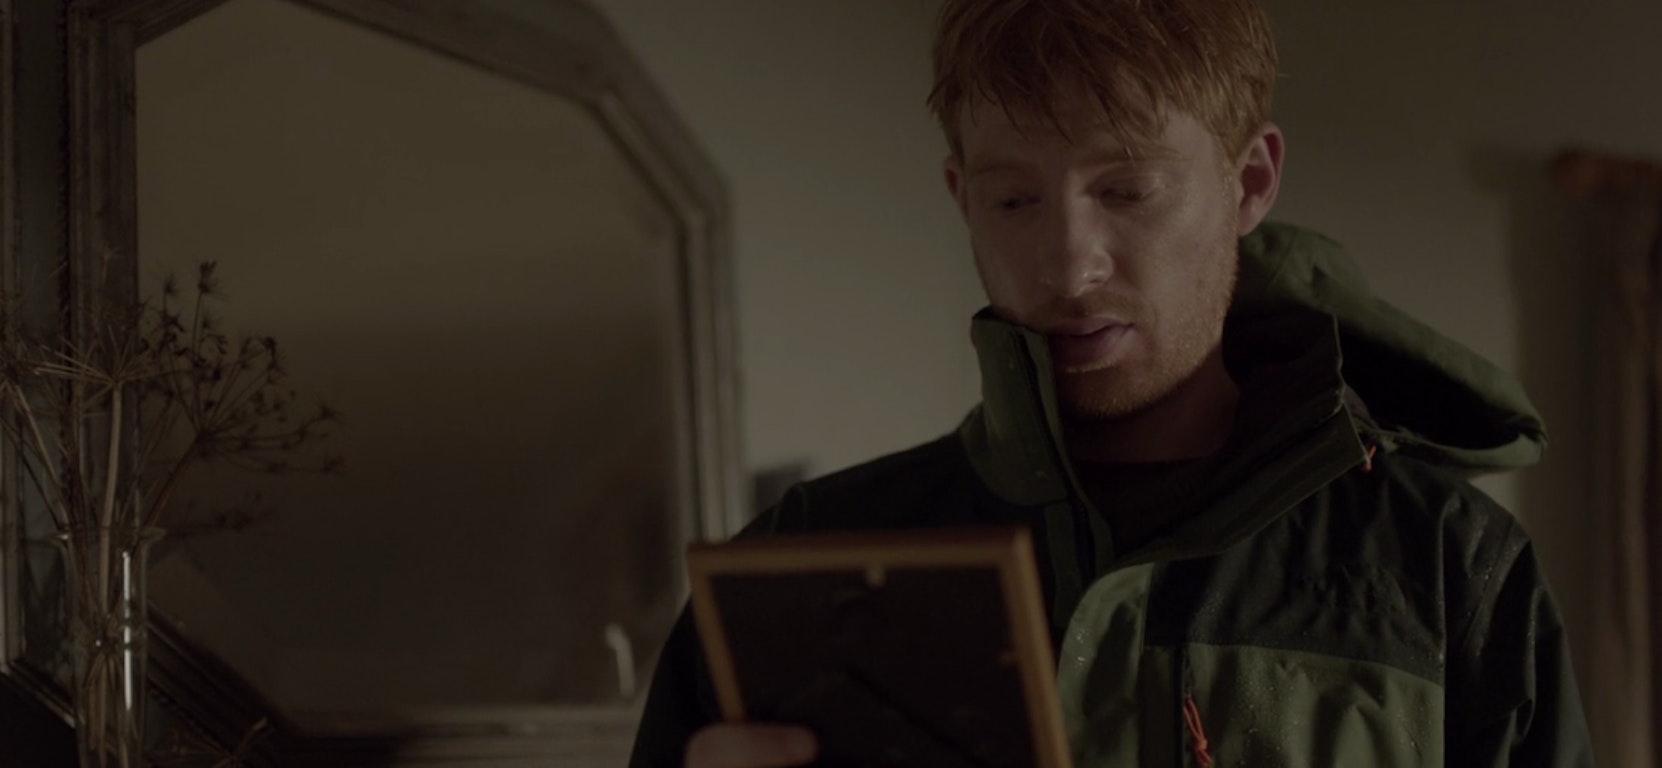 Domhnall Gleeson in 'Black Mirror'